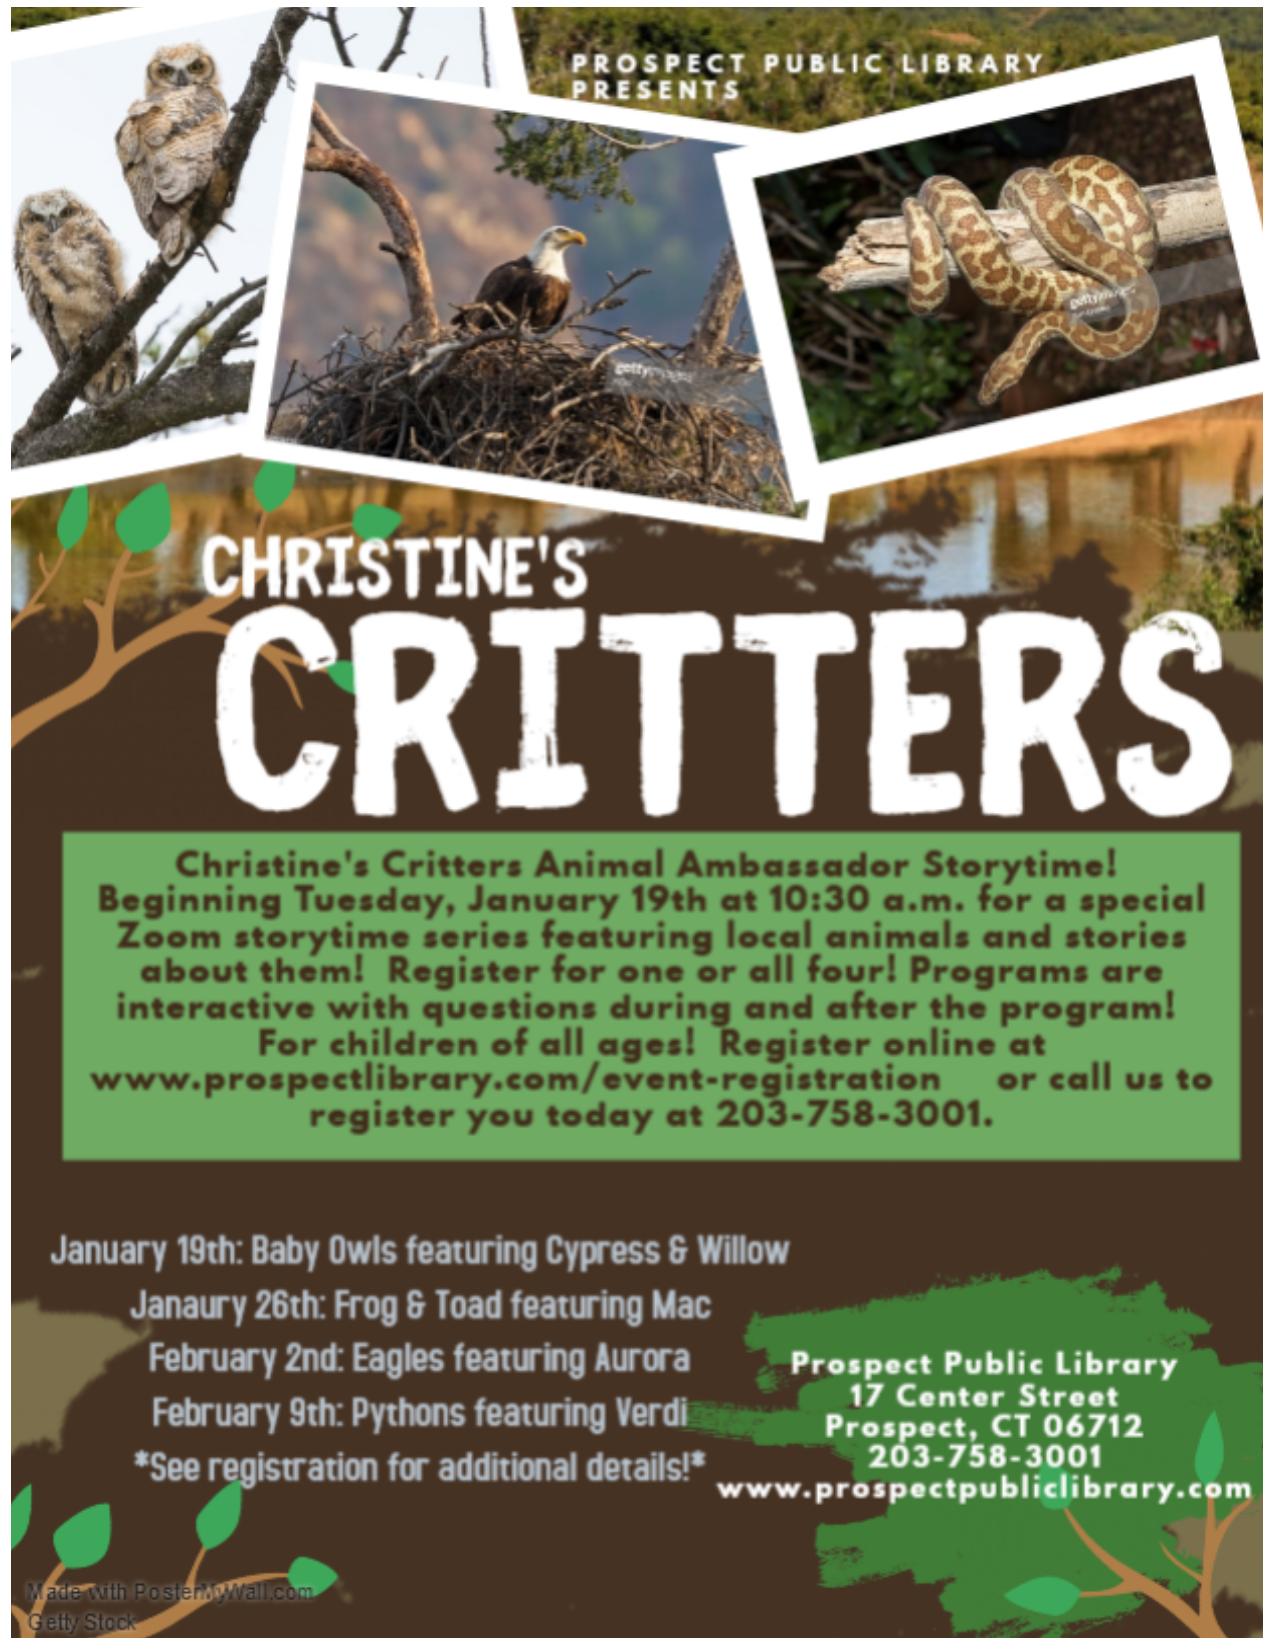 Flyer-Christine's Critters Storytime Ser